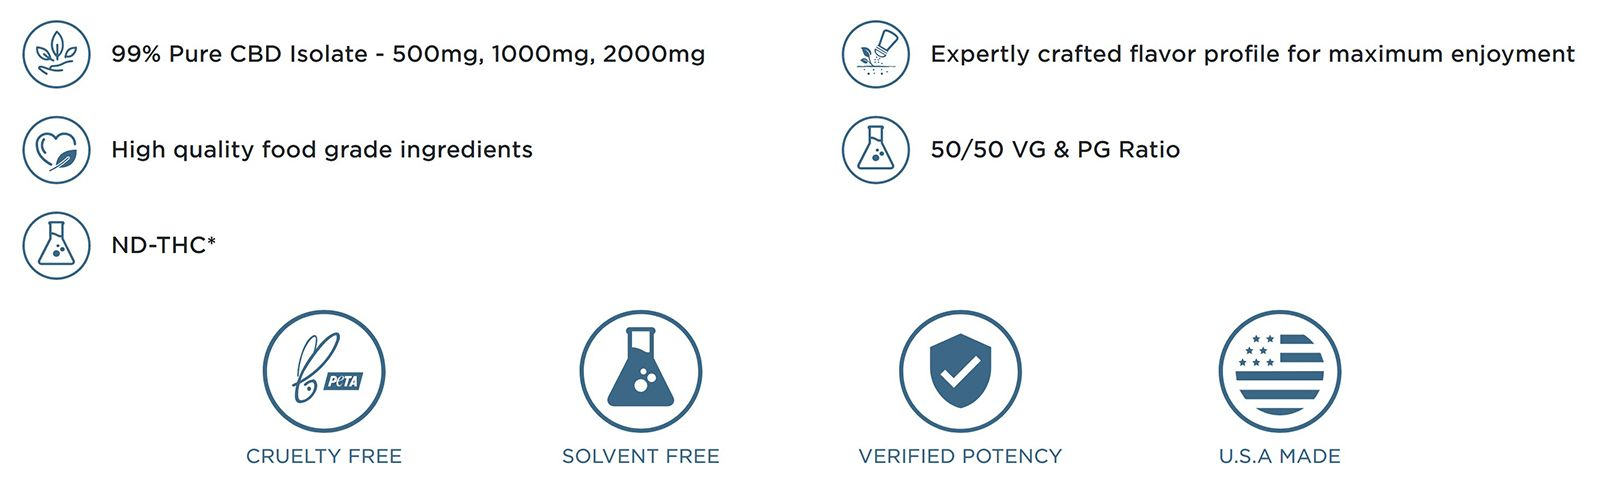 CBDfx Blue Raspberry CBD Vape Juice 500–2000mg Benefits